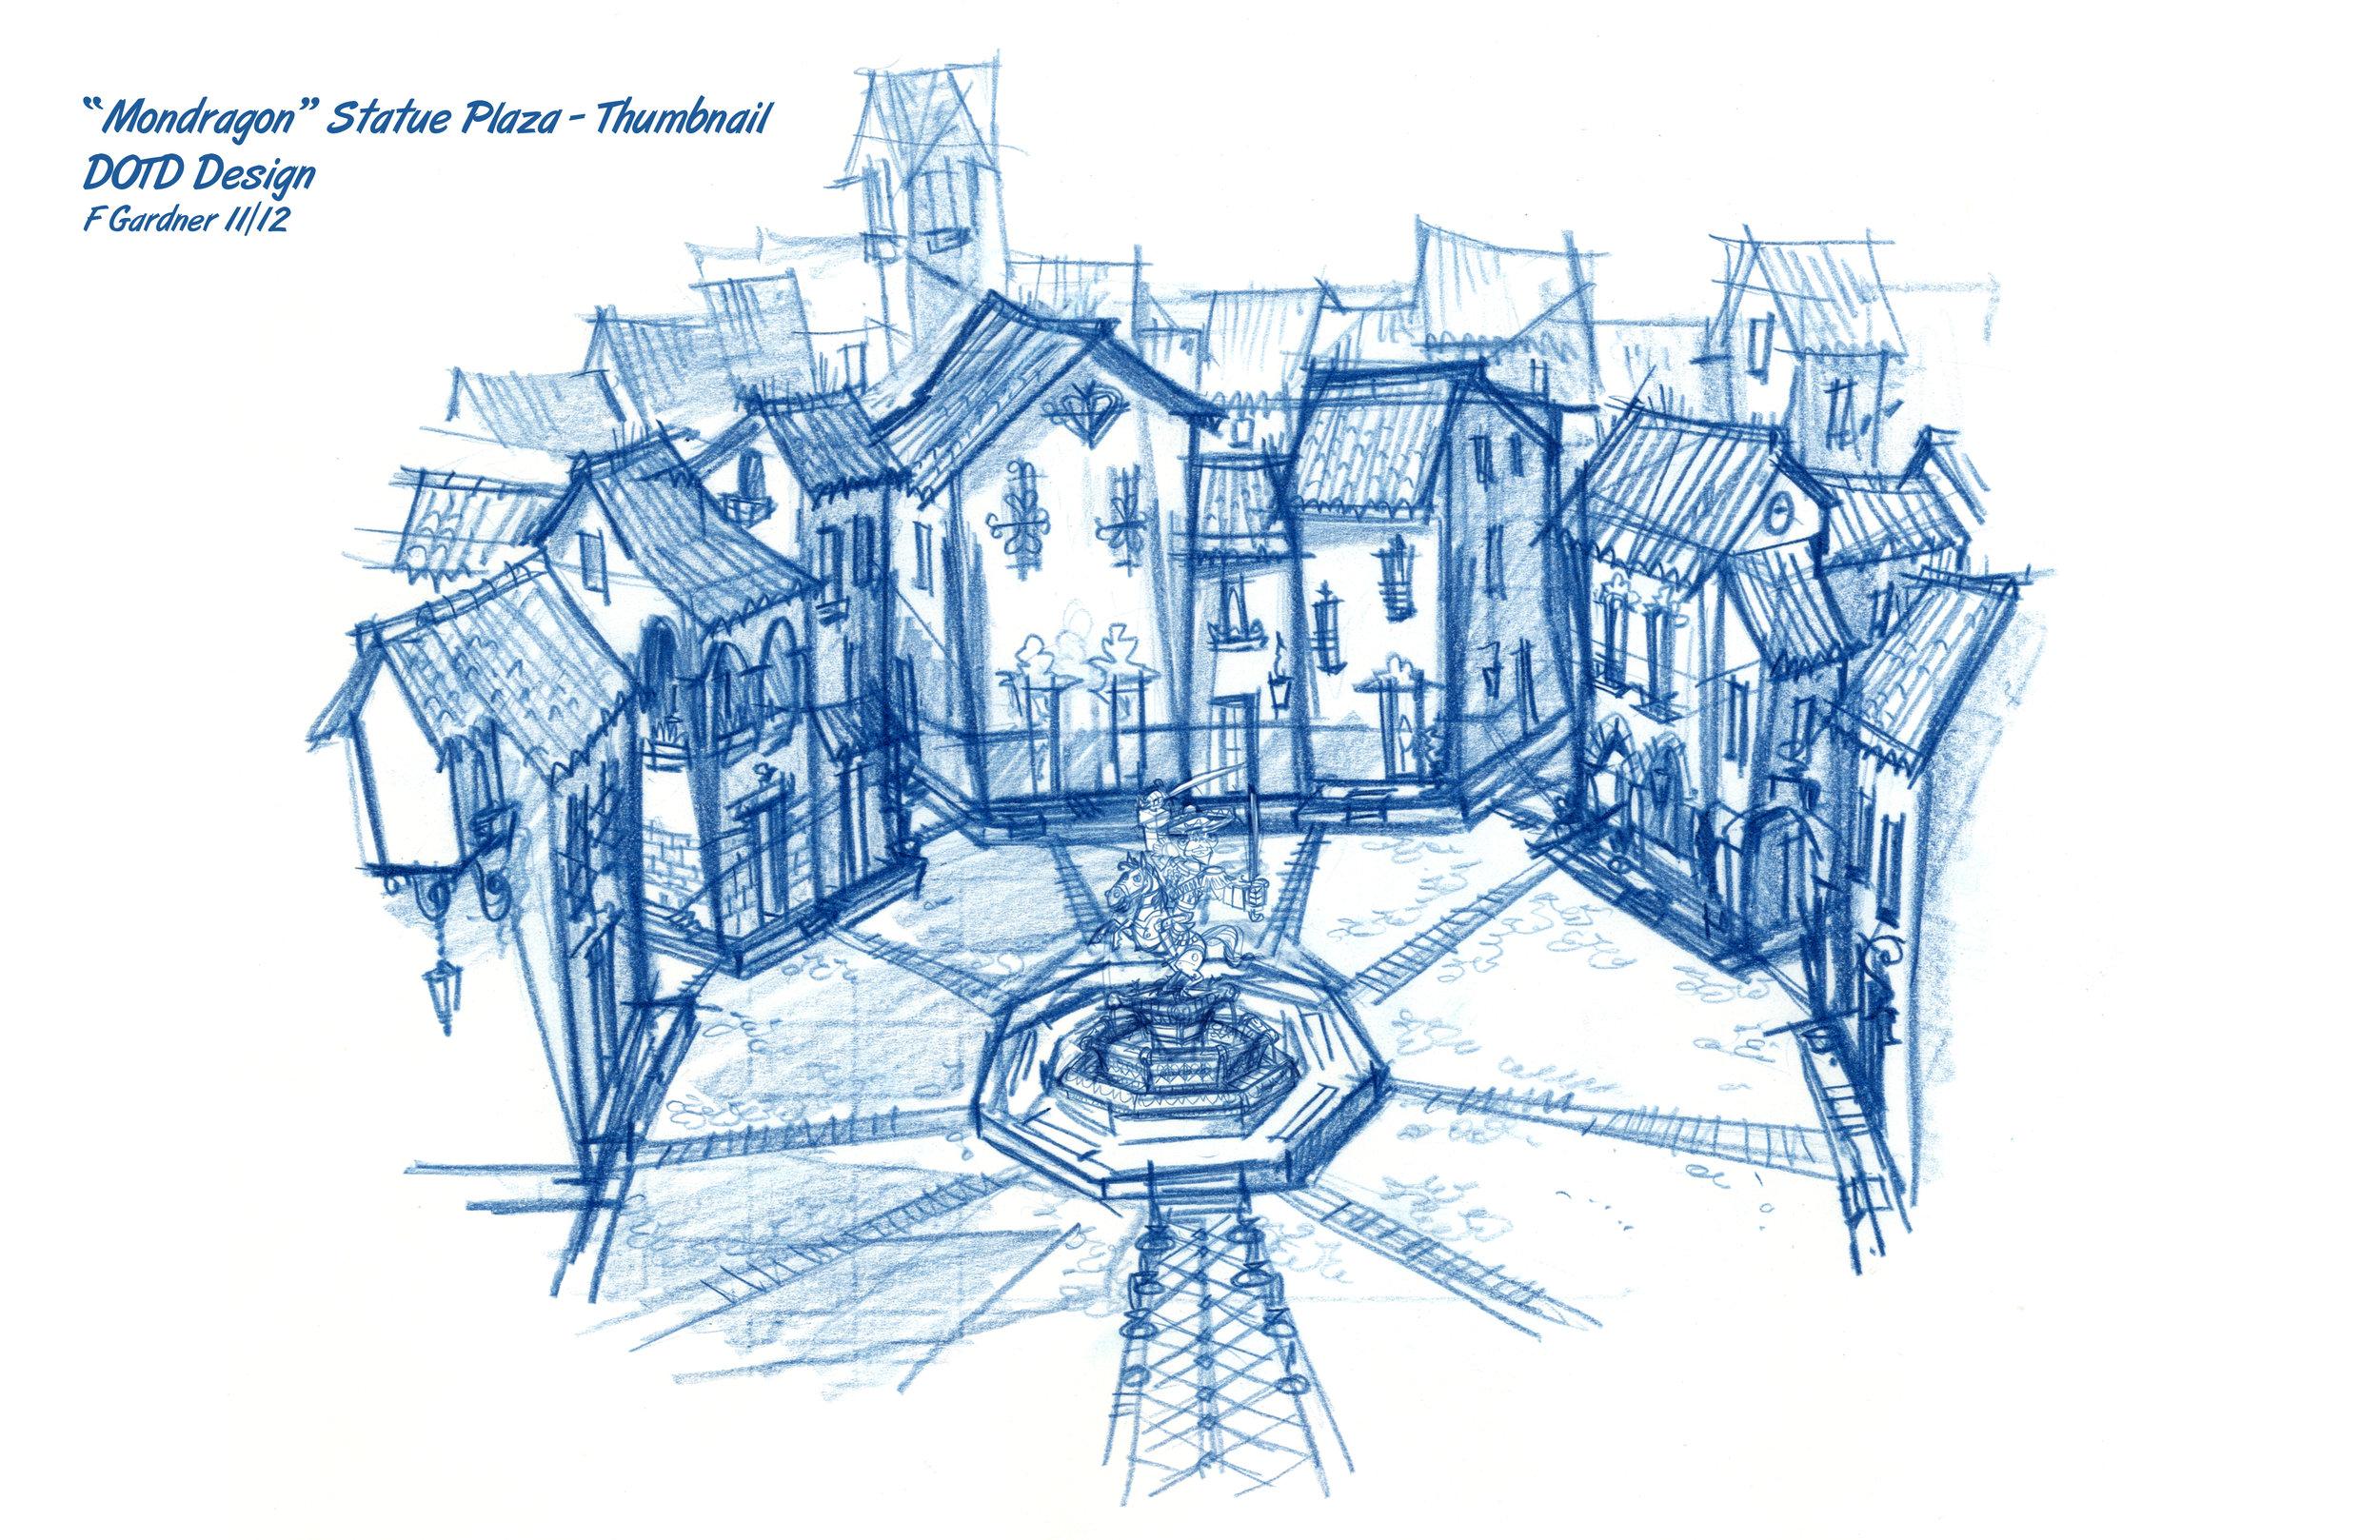 Mondragon Statue Plaza.jpg